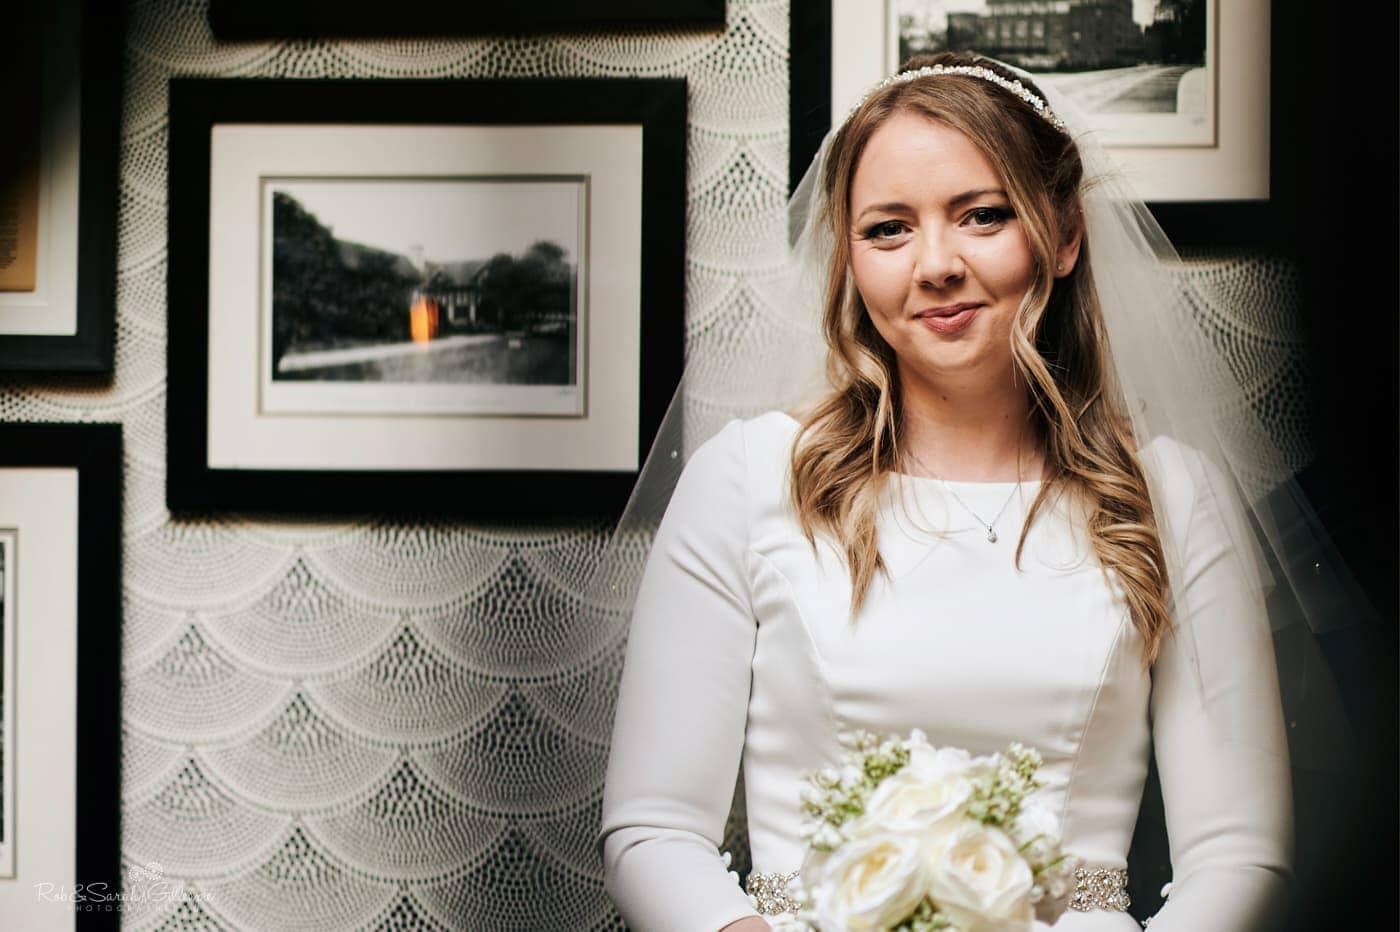 Portrait of bride smiling